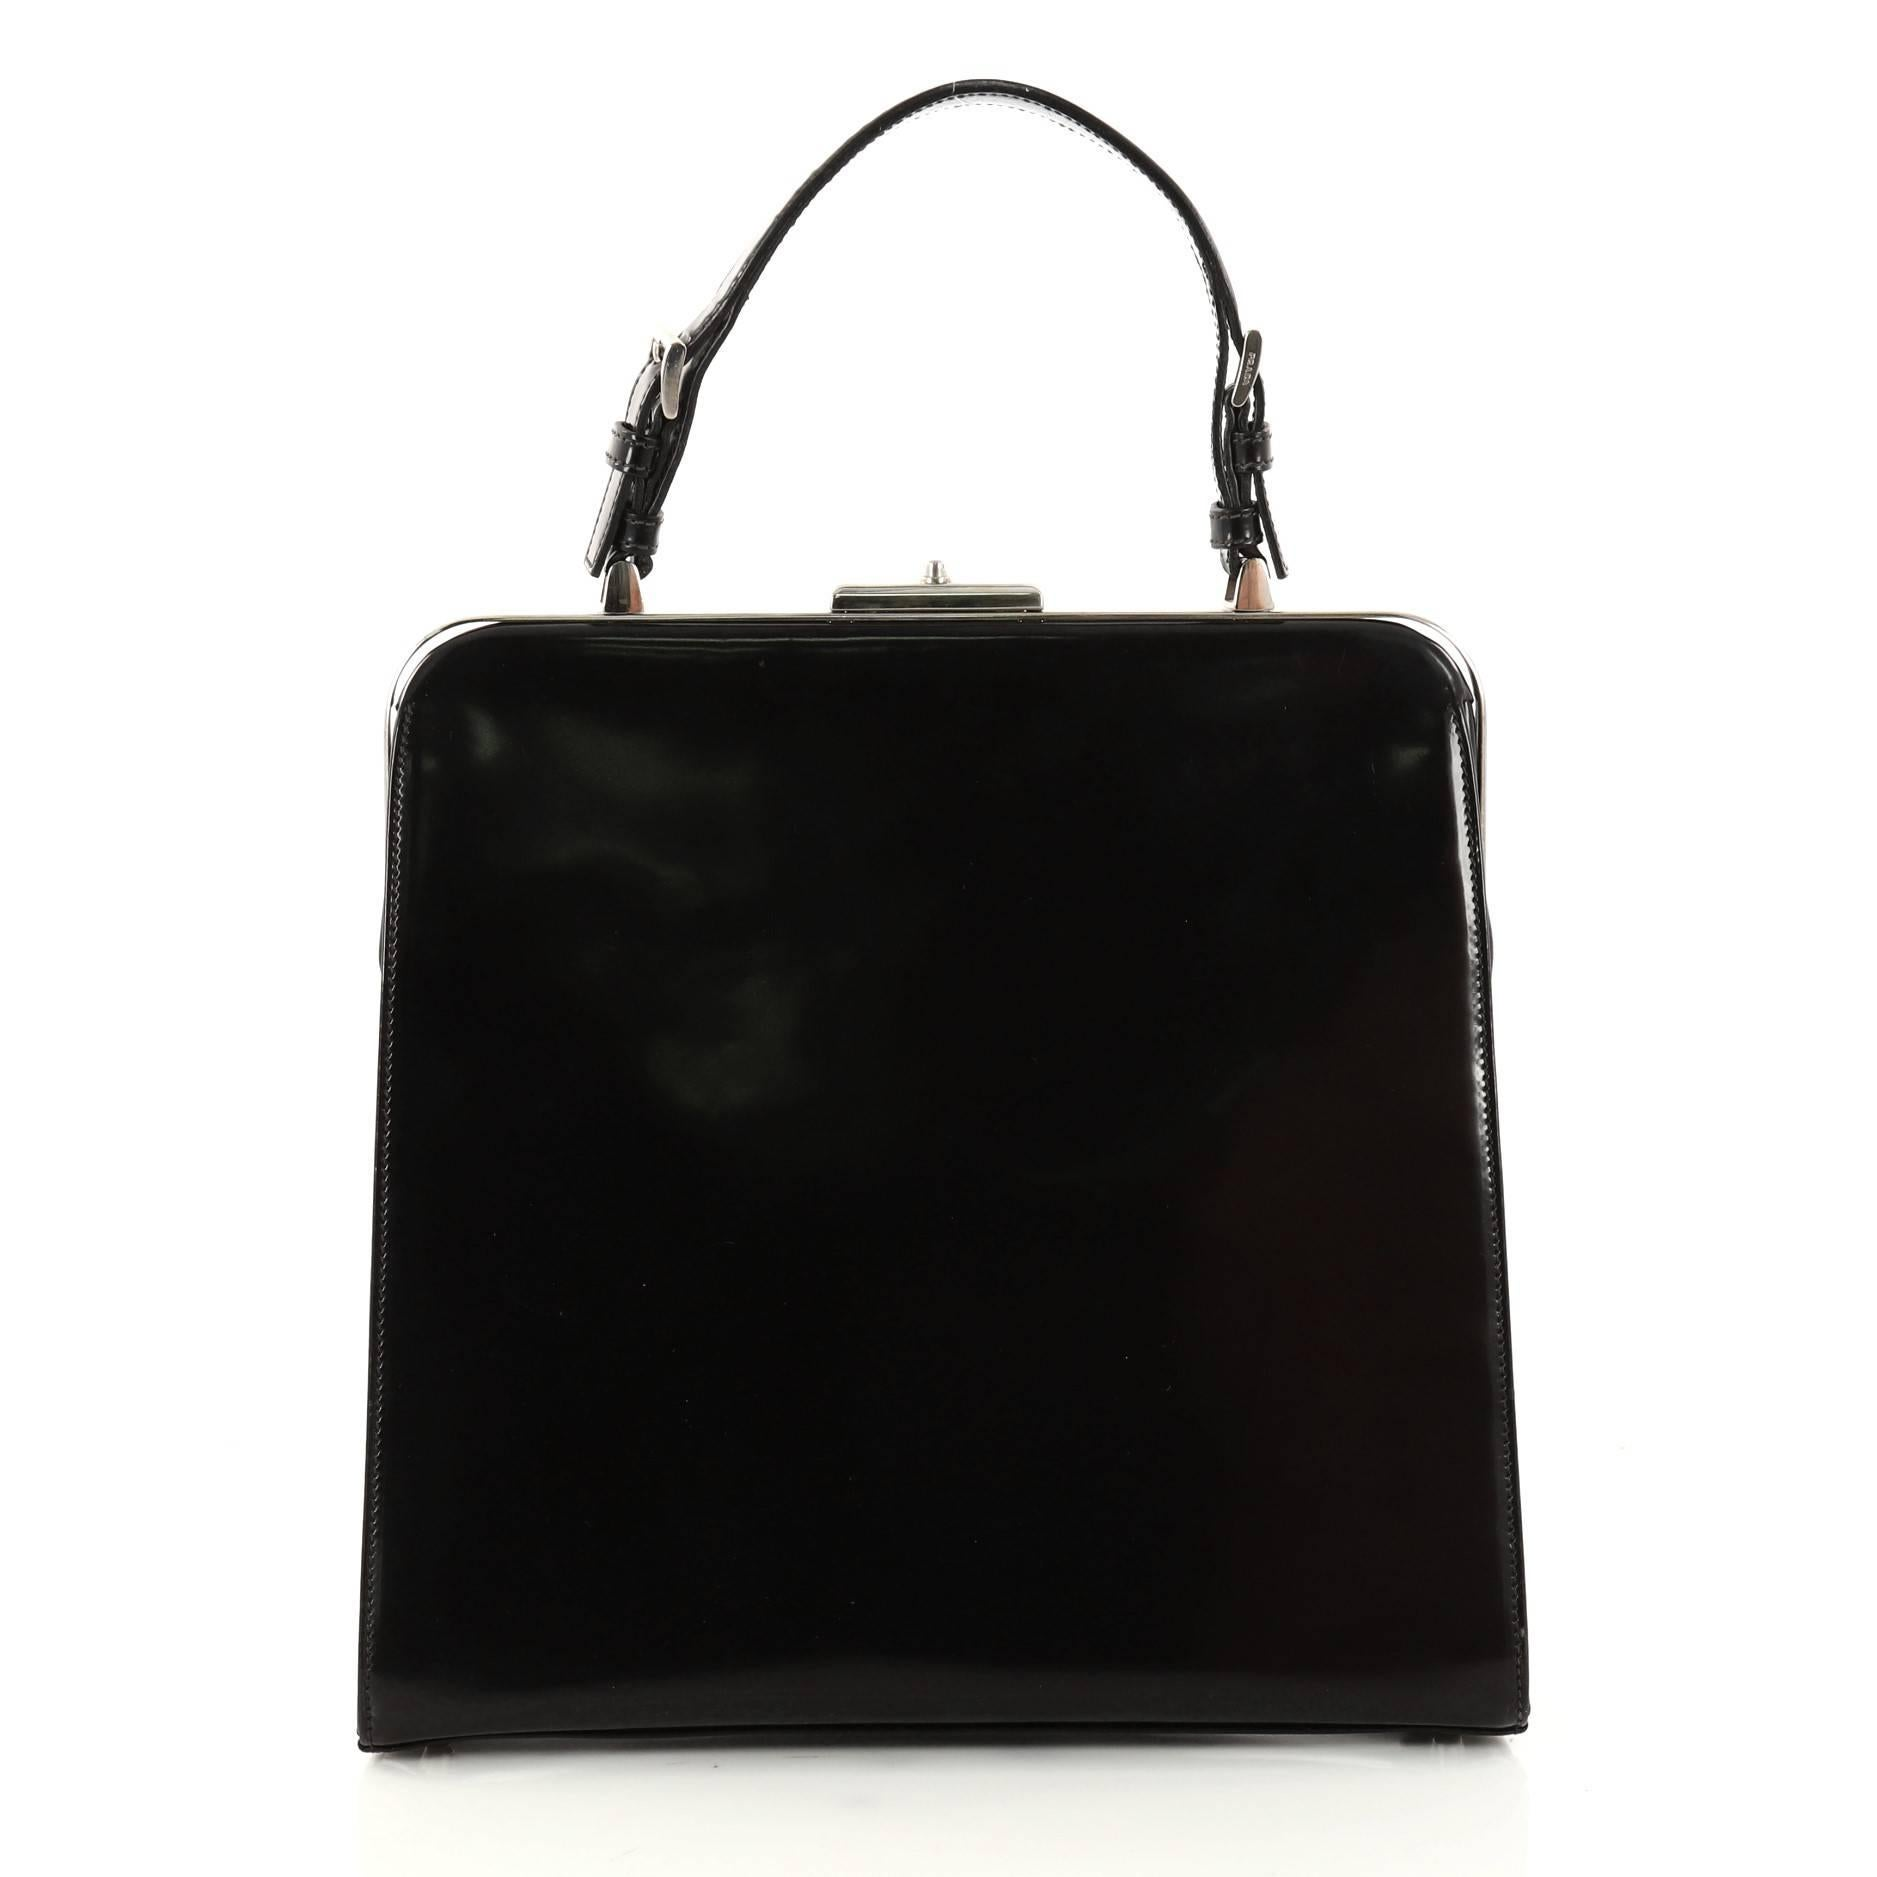 fe0349dc45 Prada Frame Handle Bag Spazzolato Leather Small at 1stdibs